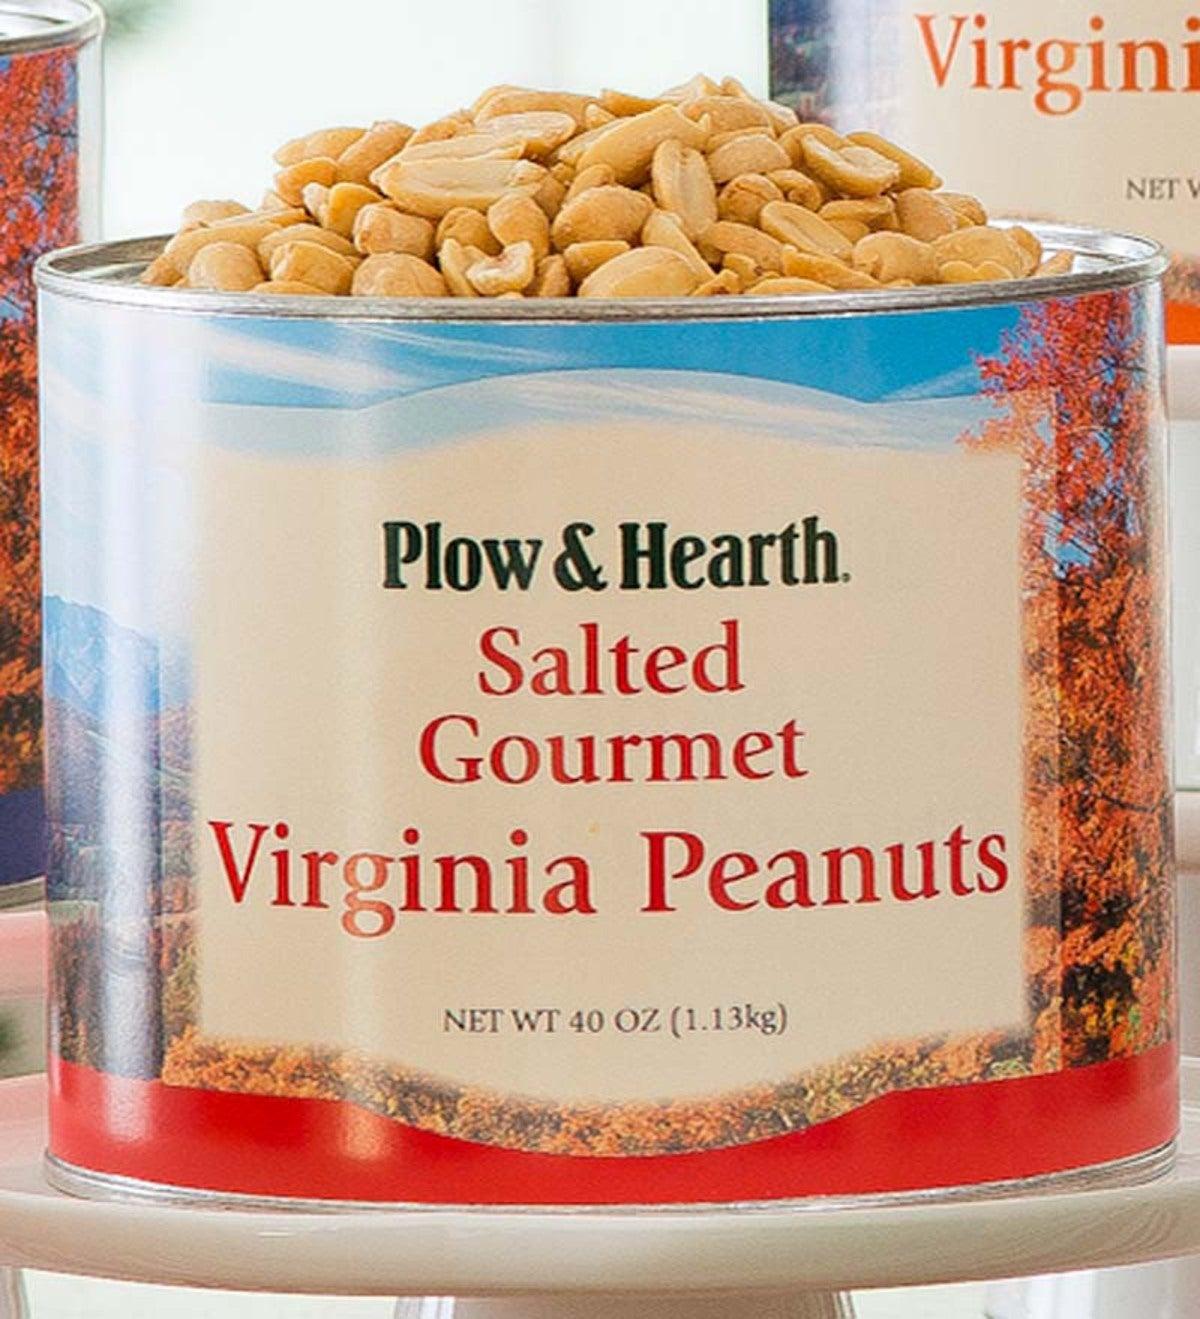 Extra Large Virginia Peanuts 40 Oz Tin Plowhearth